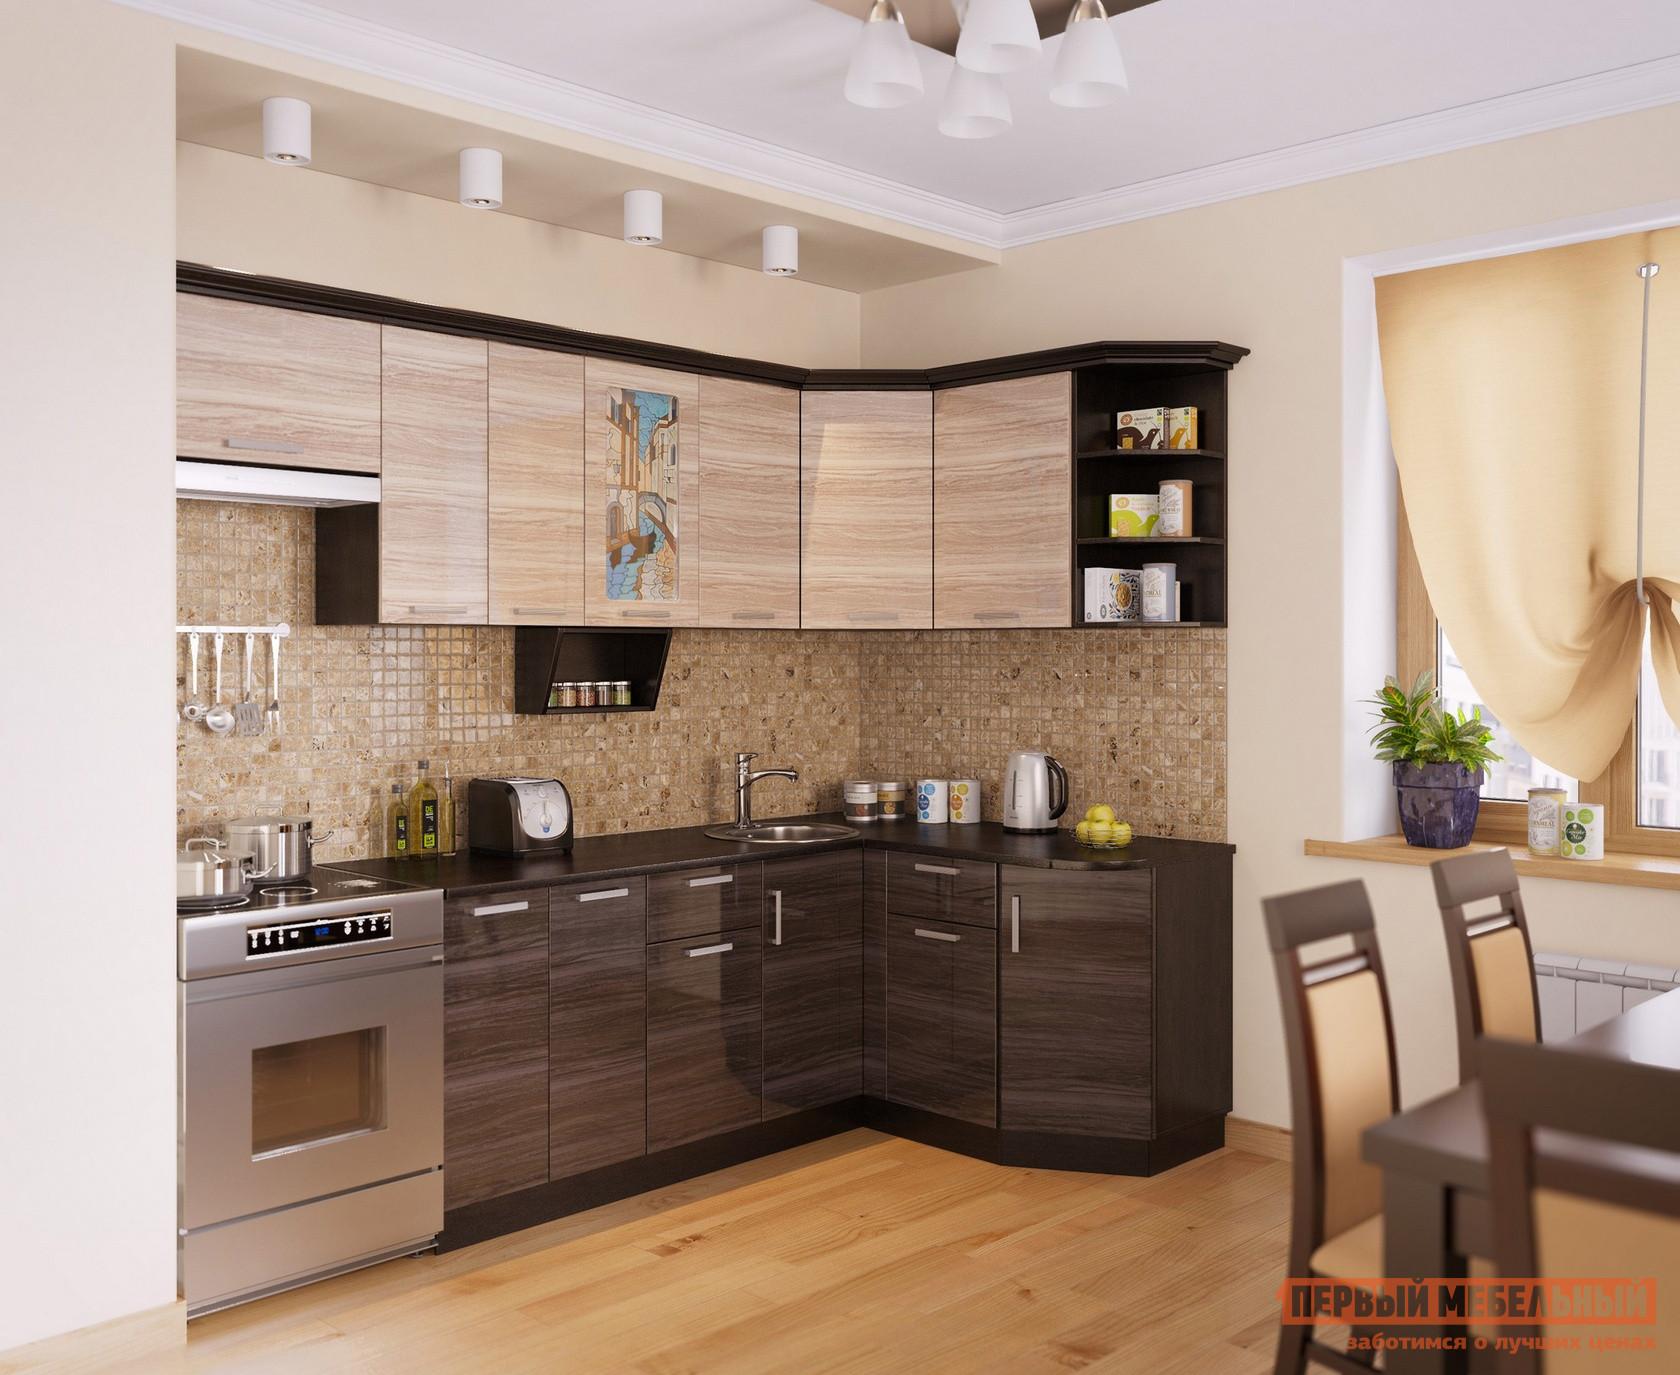 Кухонный гарнитур МО РОСТ Венеция 1 Угол кухонный гарнитур трия фэнтези 120 см